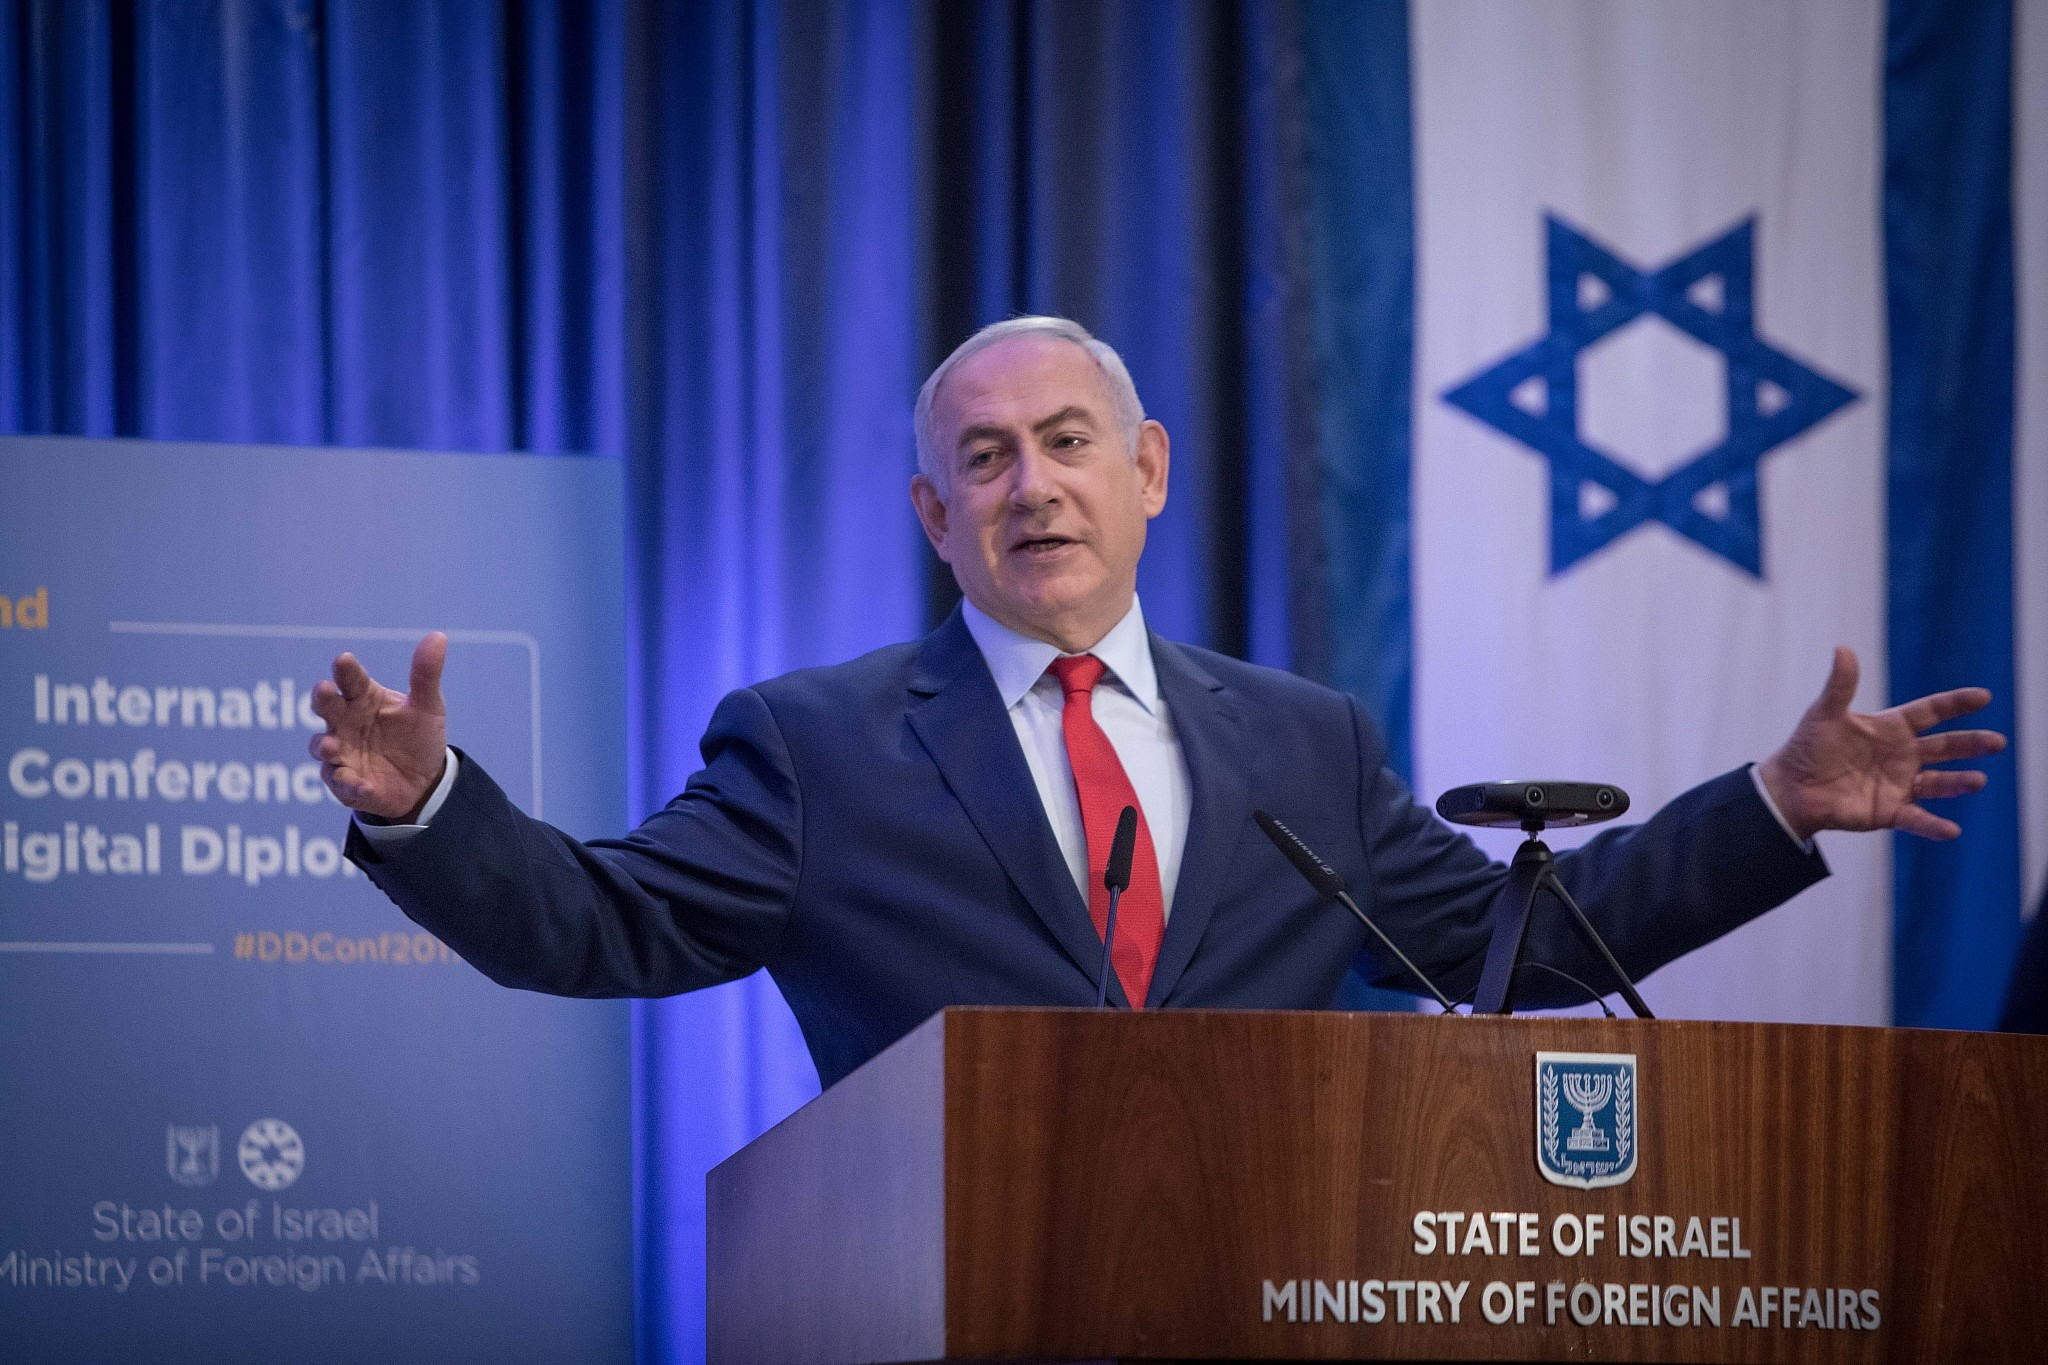 Israël s'excuse auprès de la Jordanie, son ambassade à Amman va rouvrir